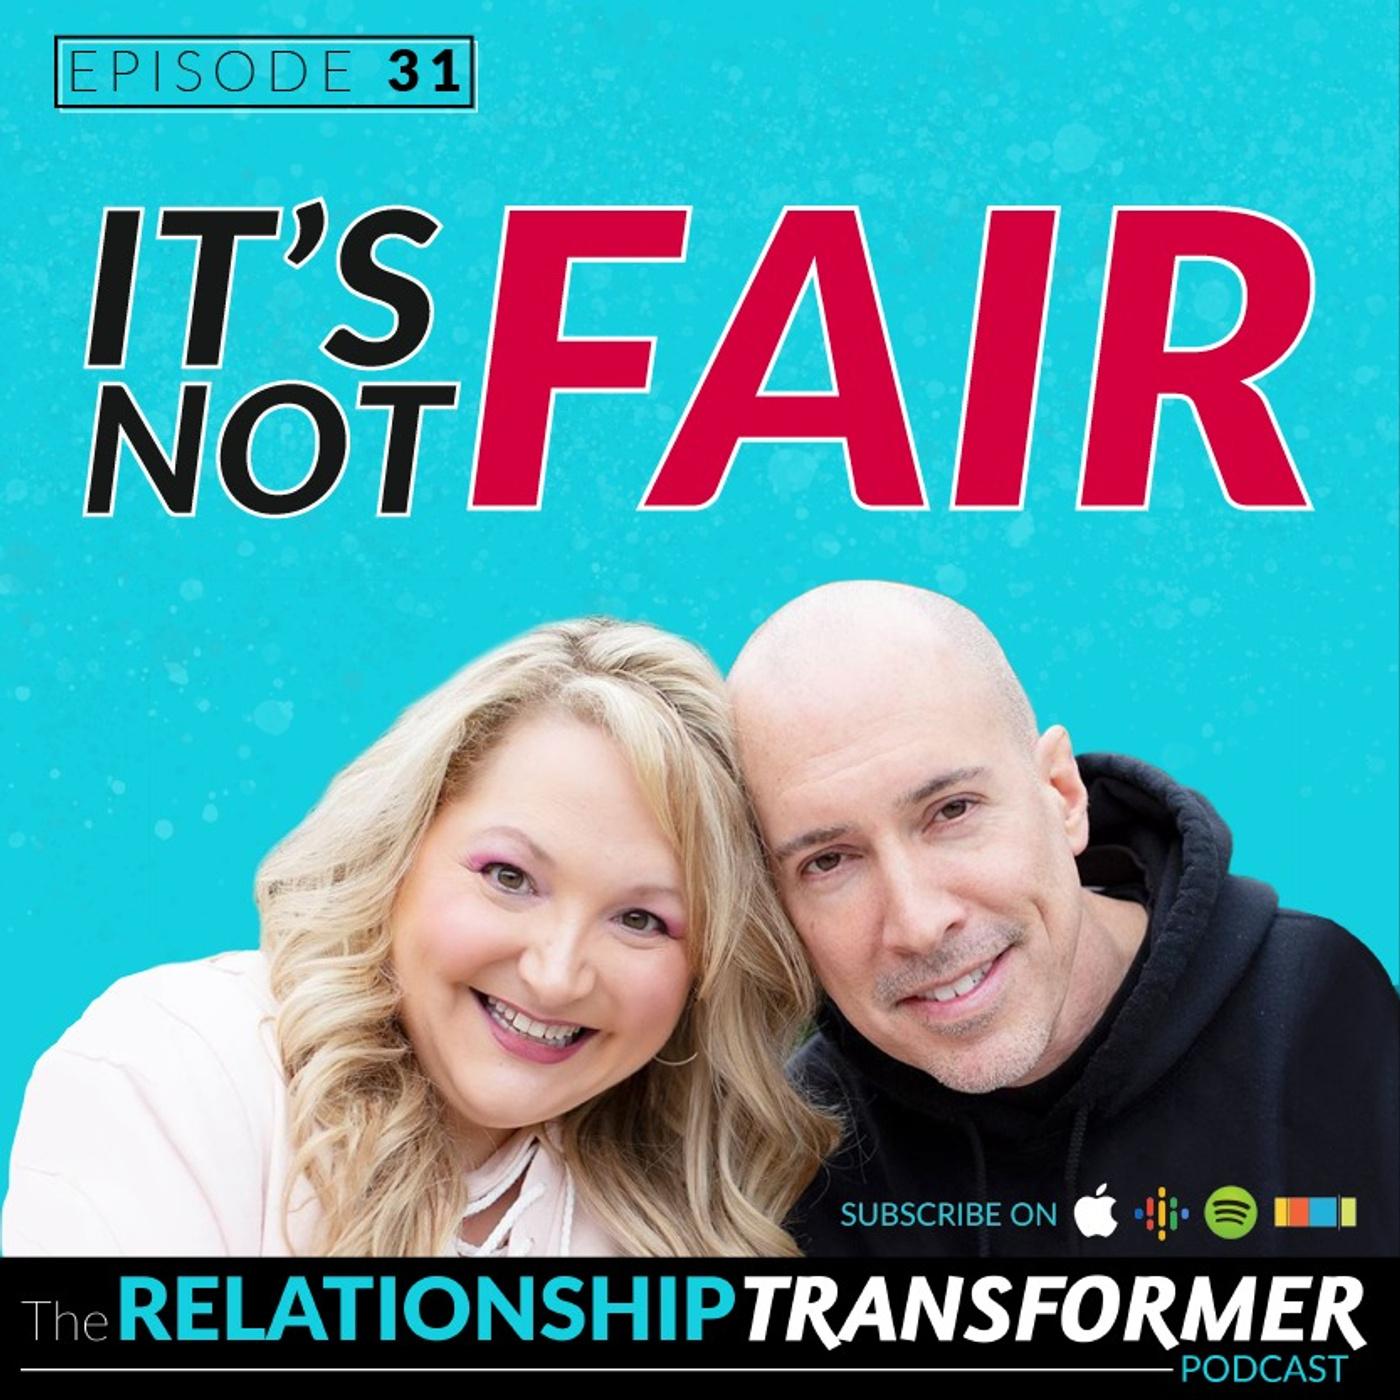 Relationship Transformers - 31: It's Not Fair